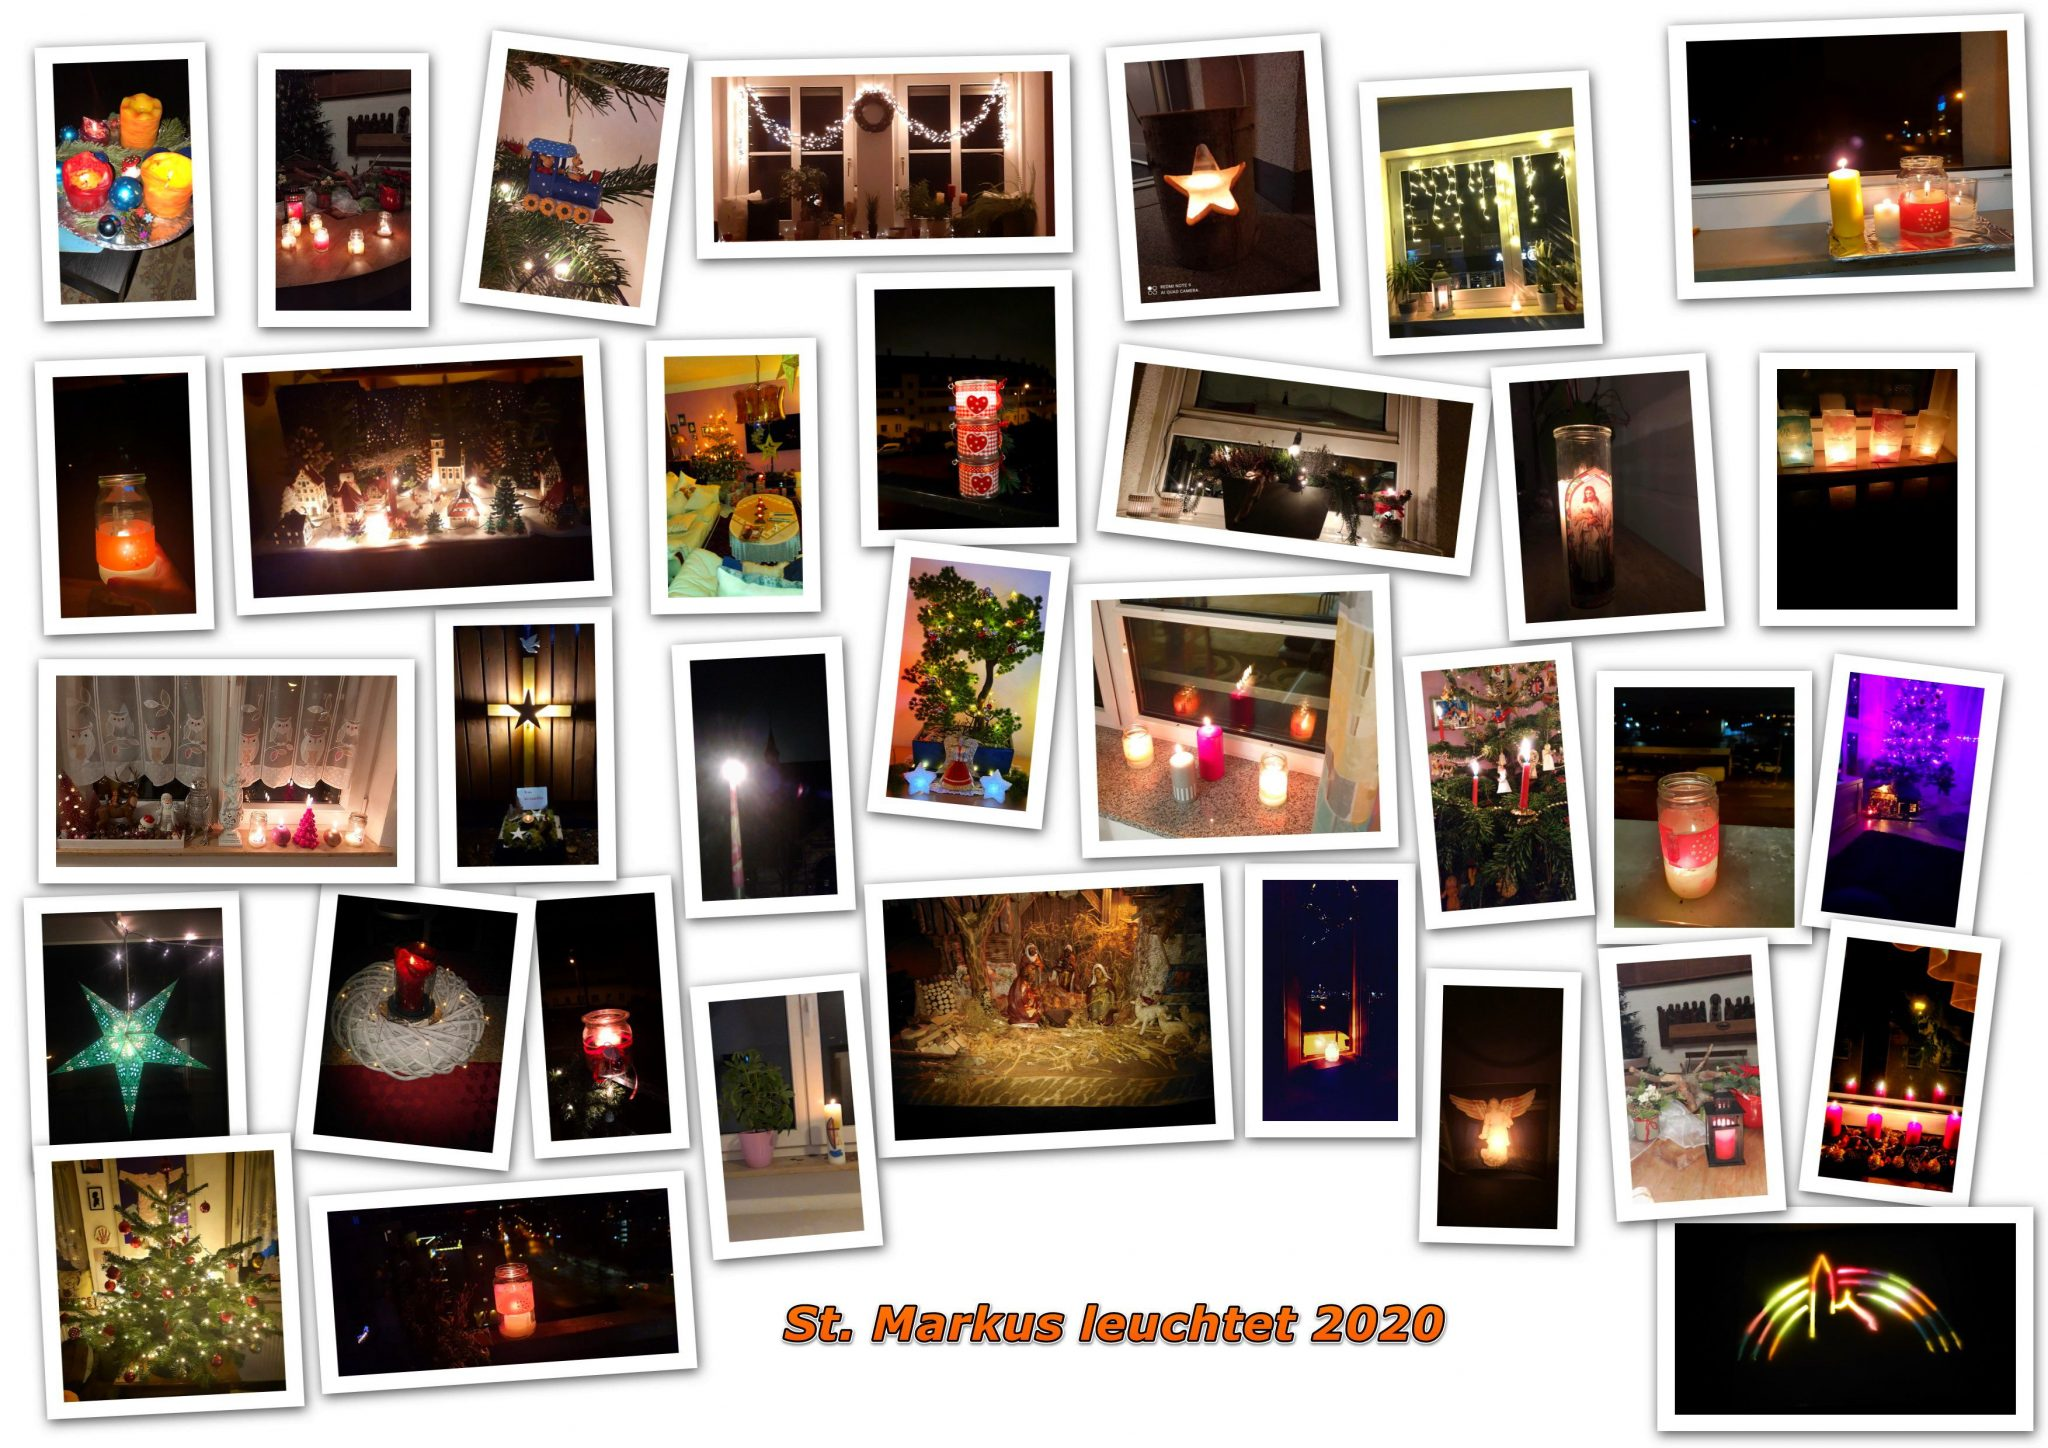 St. Markus leuchtet 2020